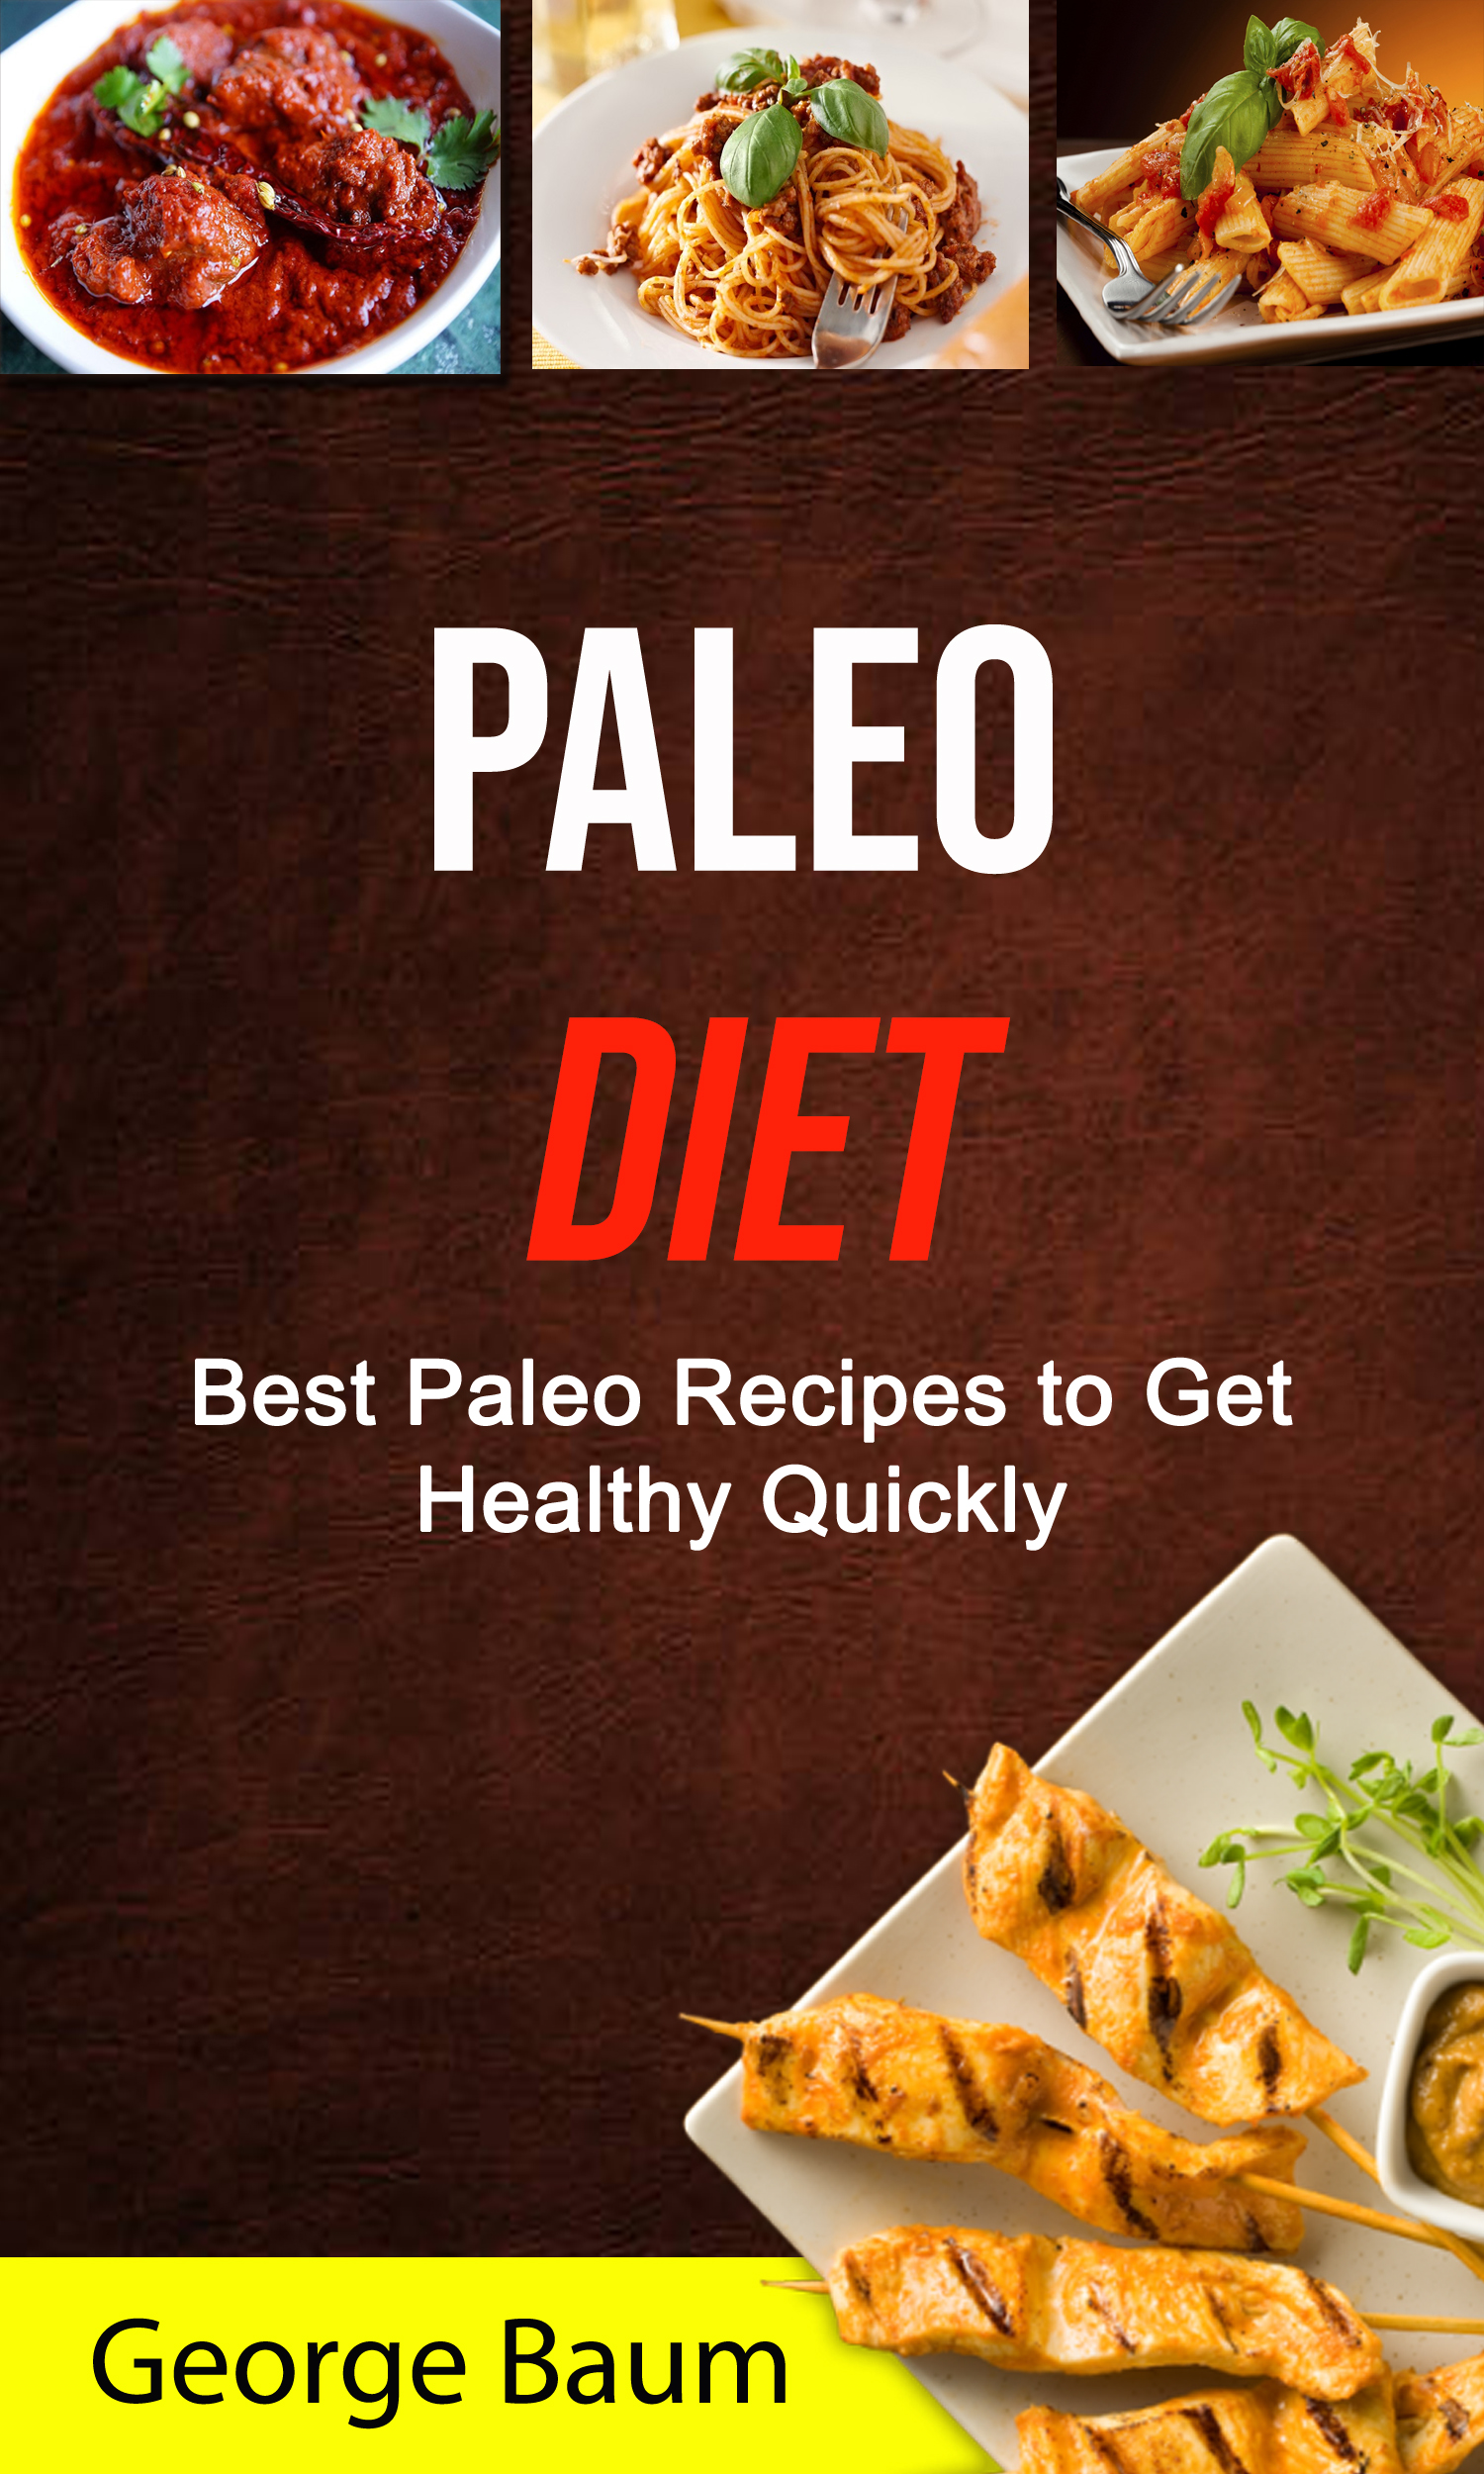 Paleo diet: best paleo recipes to get healthy quickly